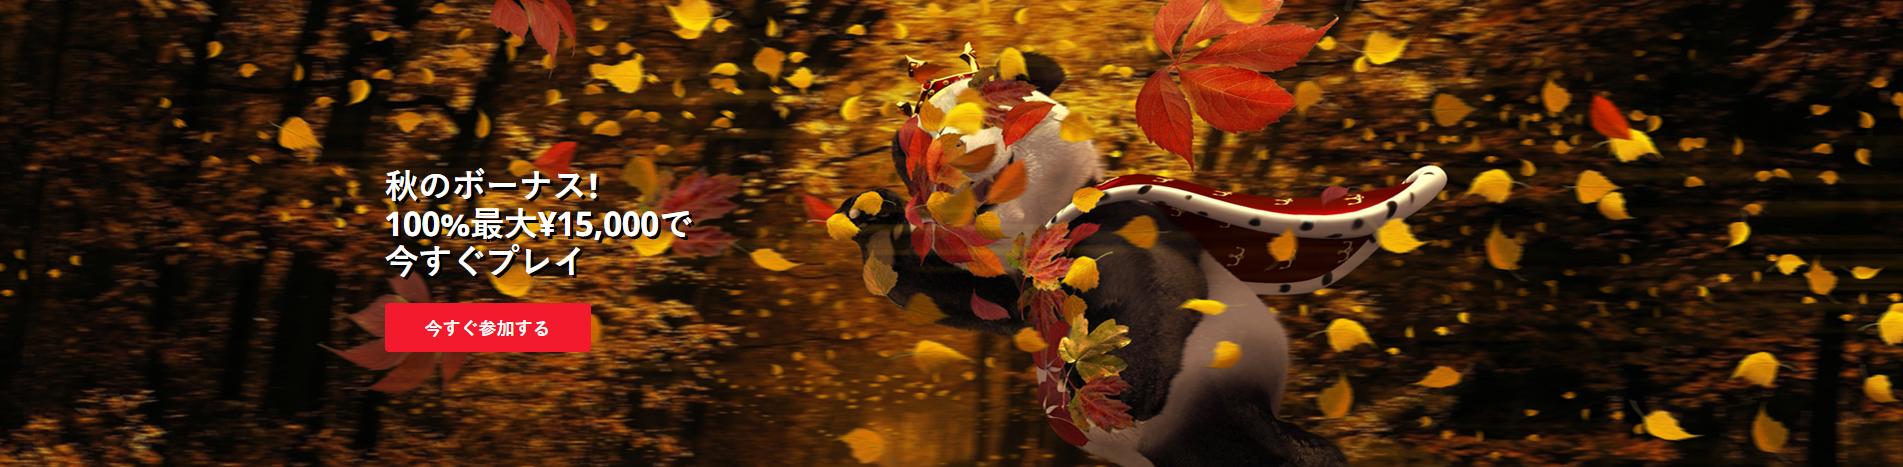 Royal Panda Casino Content Images 02 - Japan CasinoTop